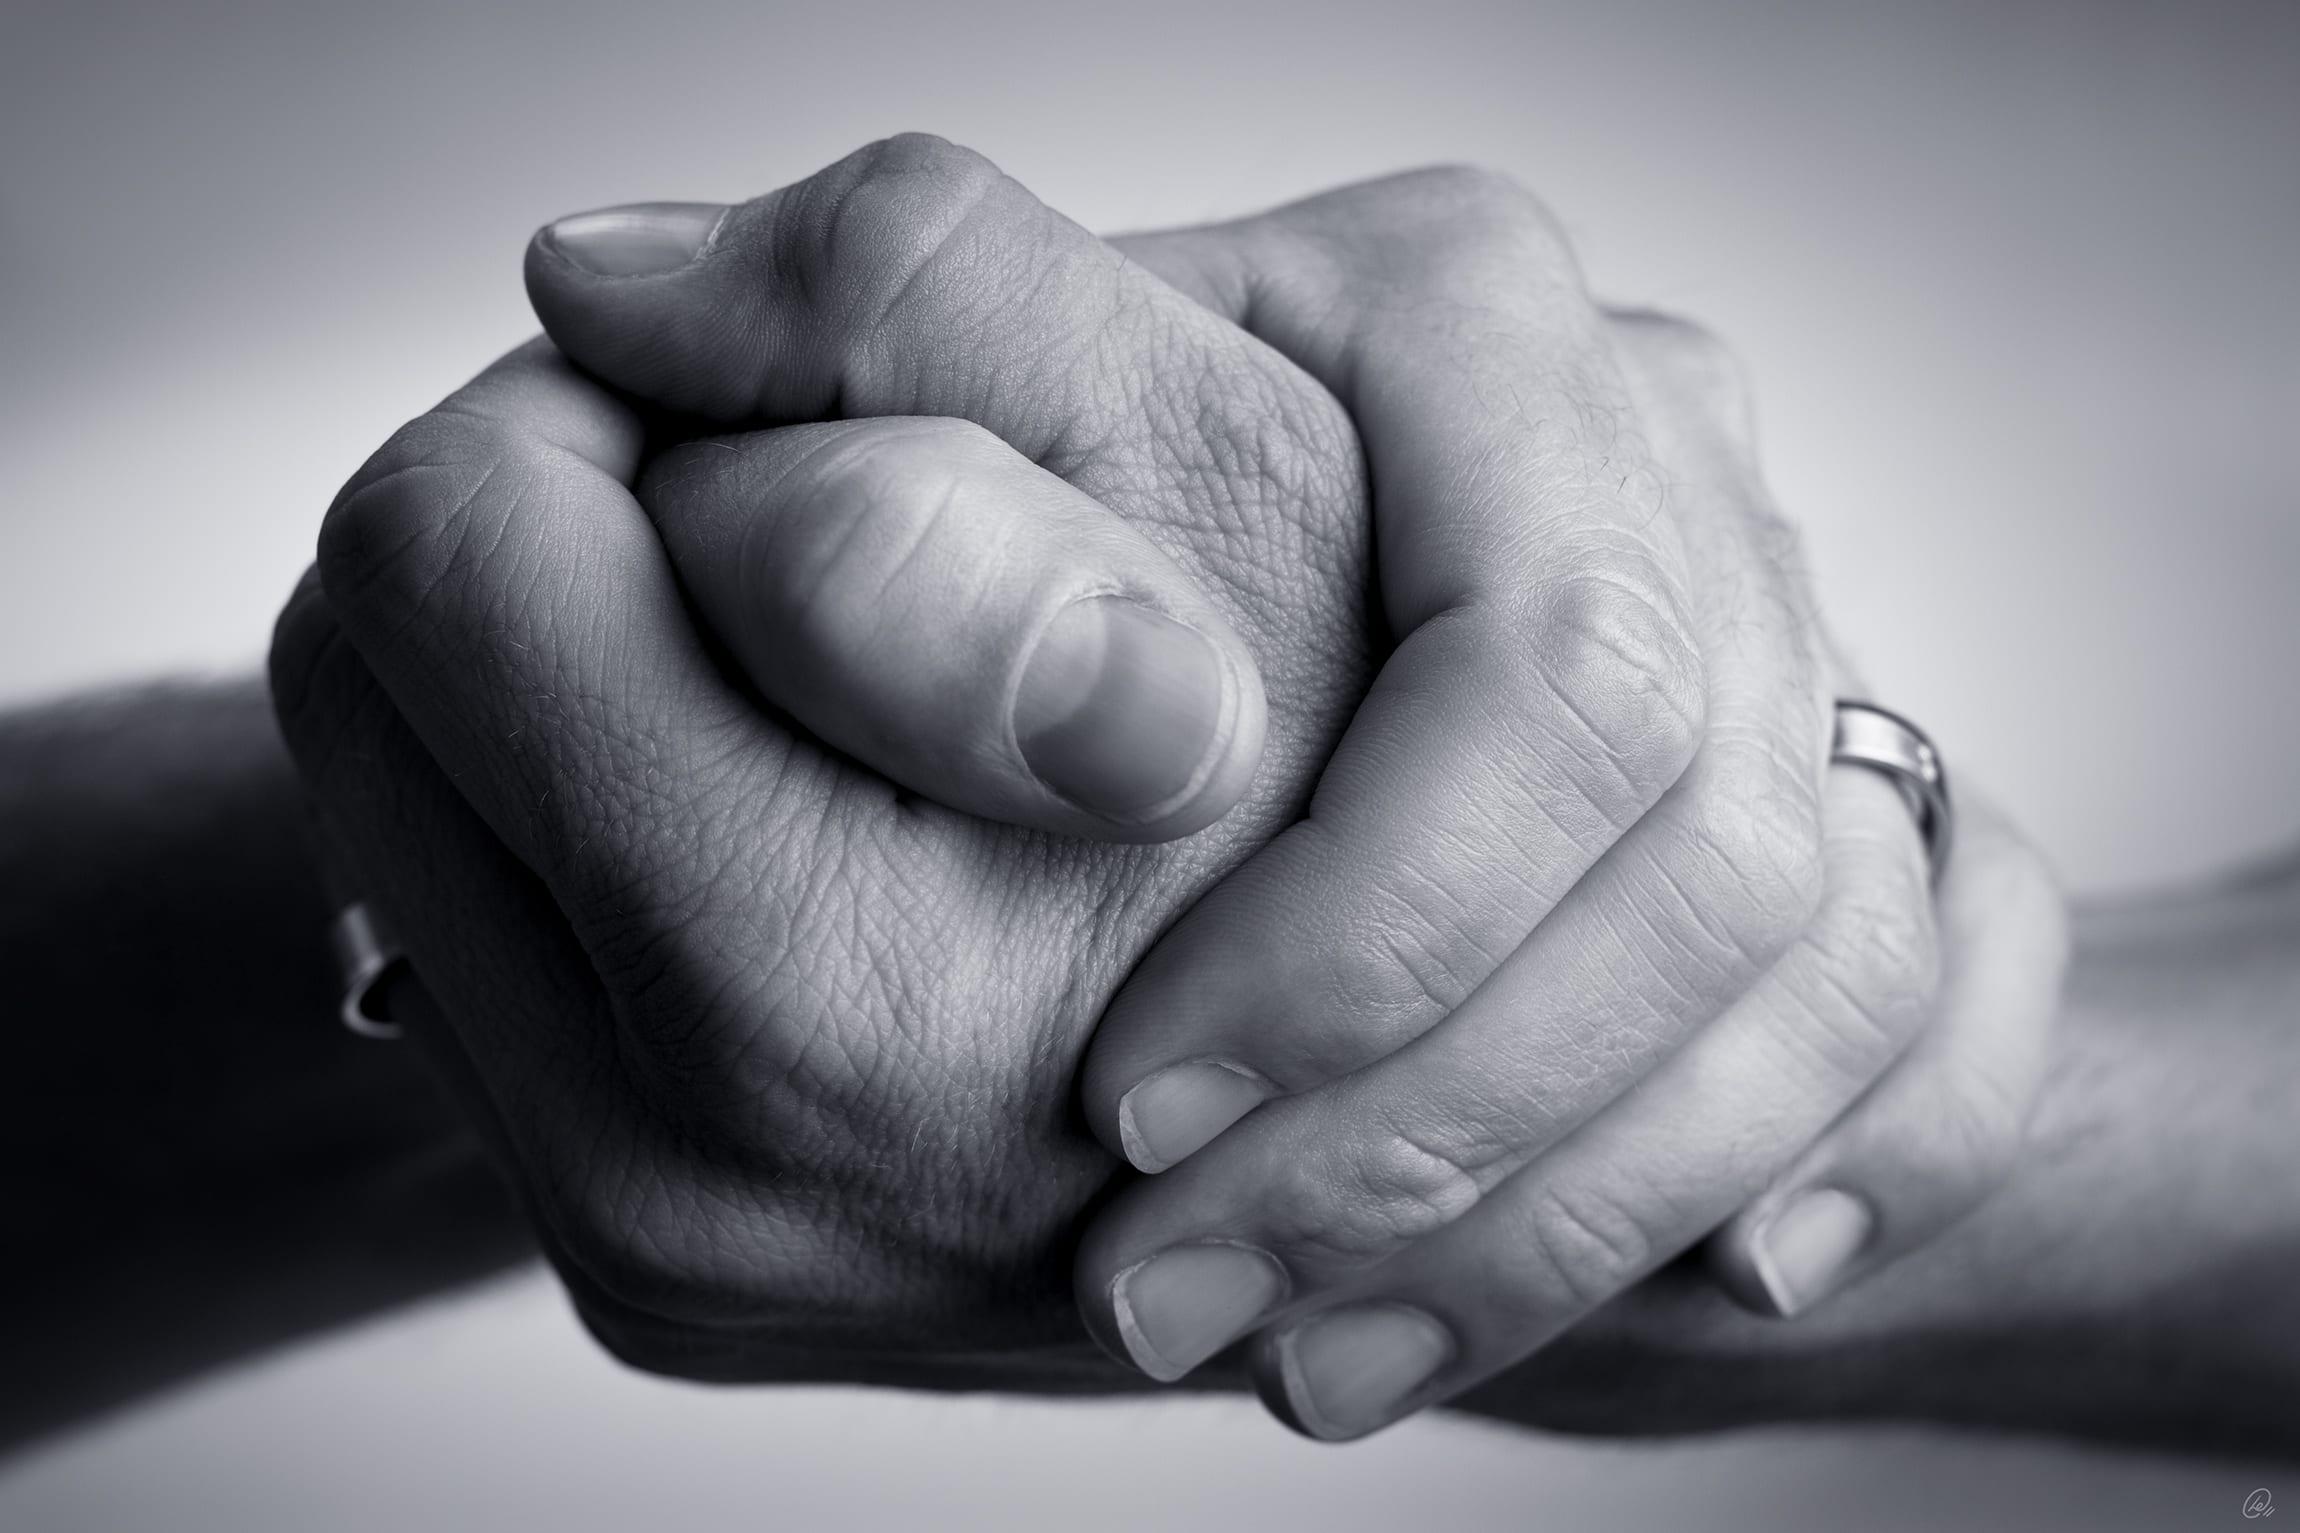 Handshake image courtesy of Flickr user LeonArts.at